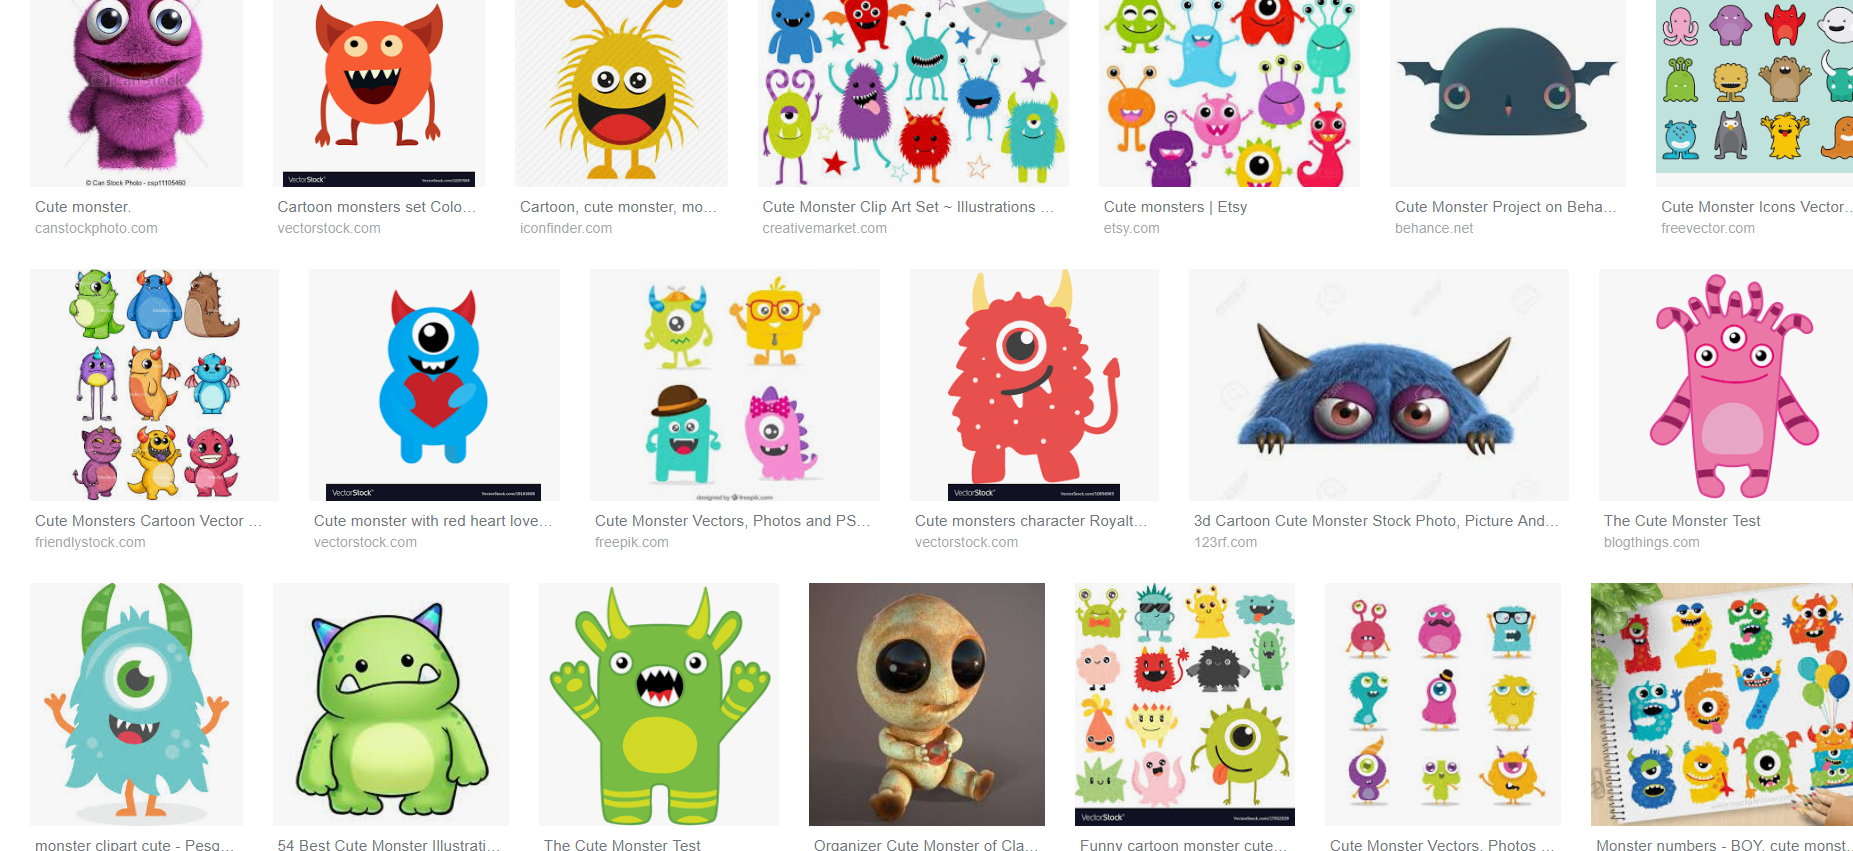 https://www.google.com/search?q=cute+monster&source=lnms&tbm=isch&sa=X&ved=0ahUKEwjsvdPJrsDgAhXN8KYKHXKuAMwQ_AUIDigB&biw=1536&bih=723